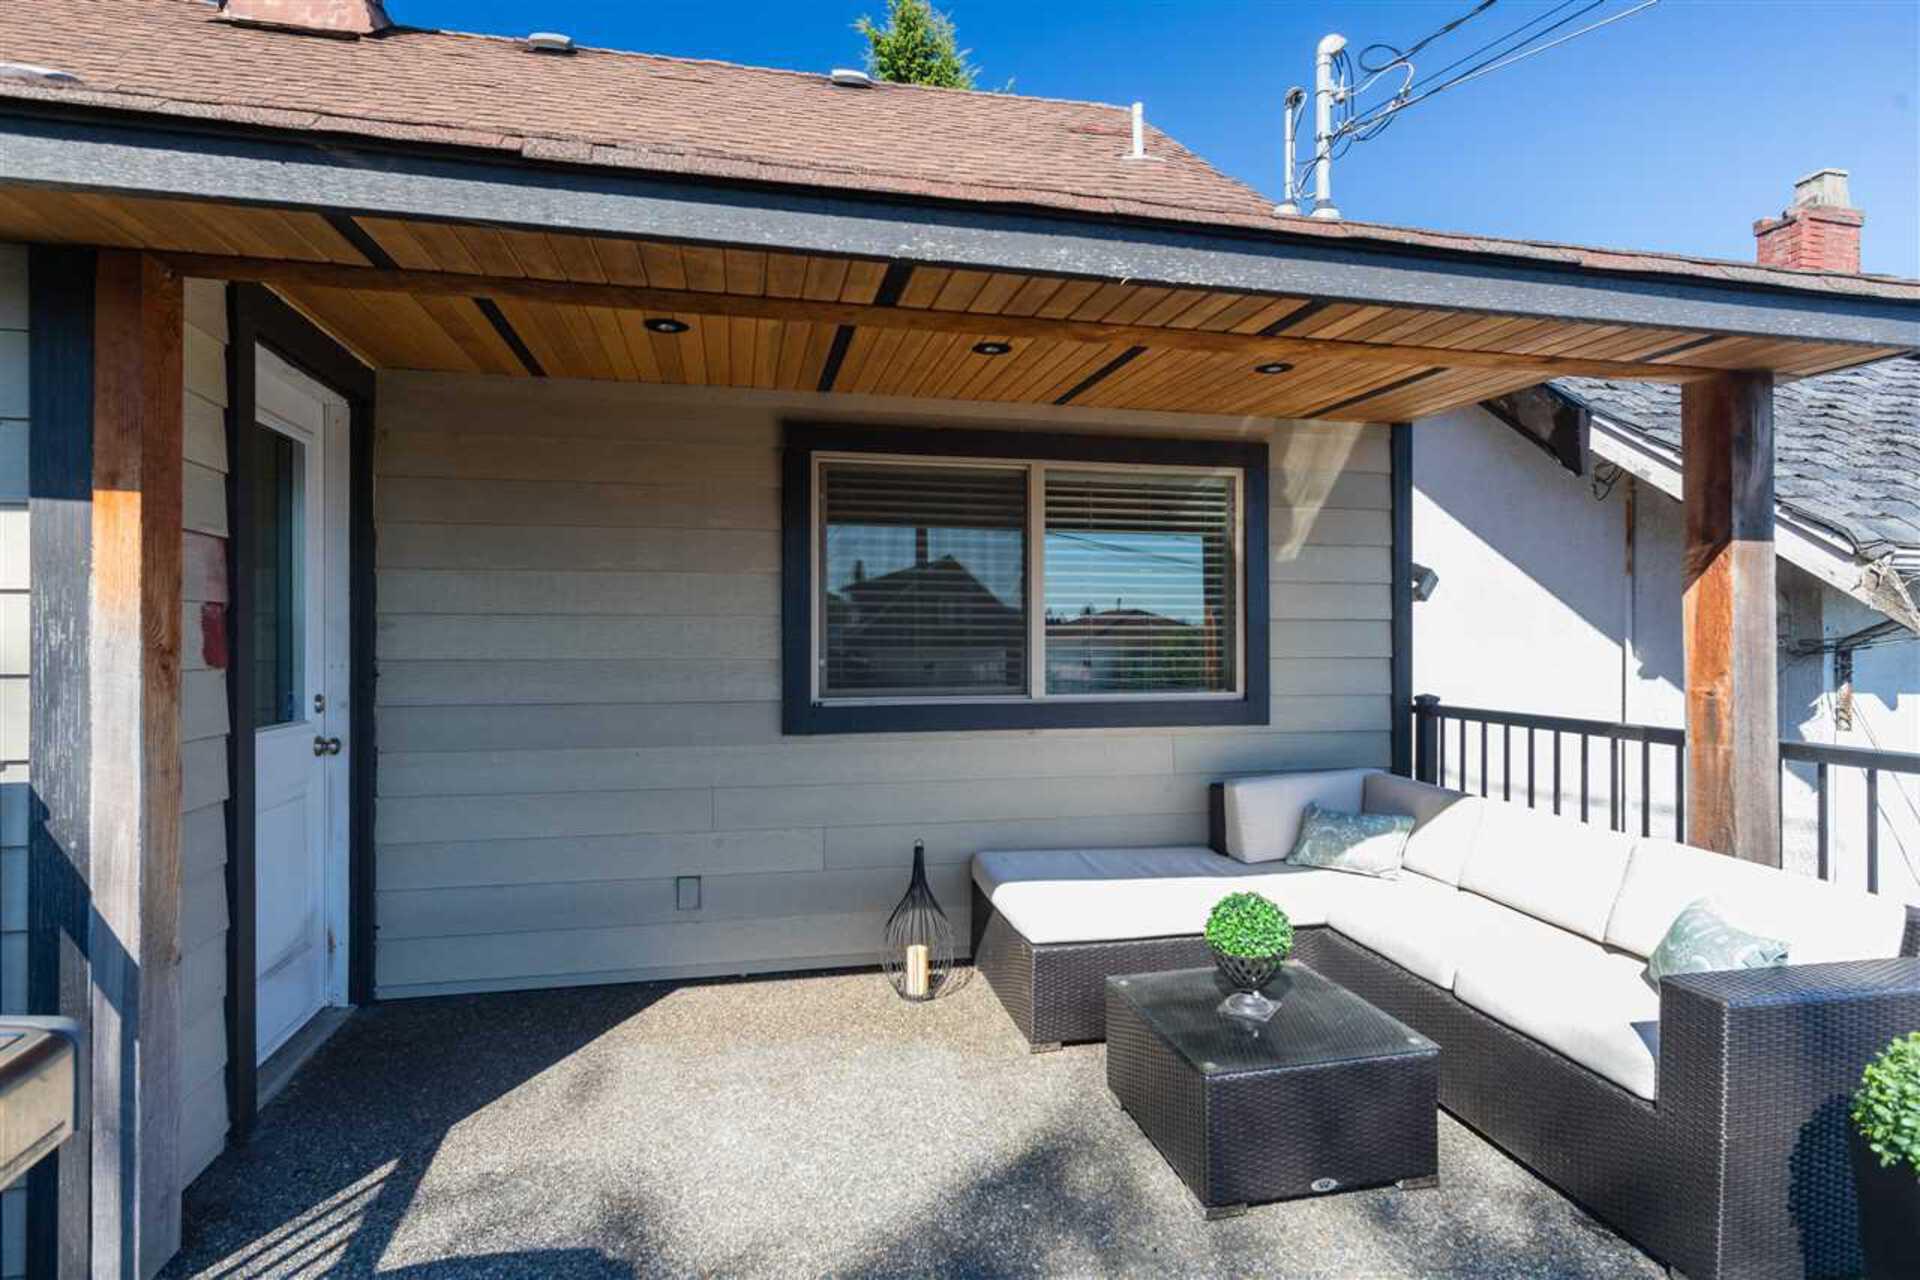 2904-turner-street-renfrew-ve-vancouver-east-24 at 2904 Turner Street, Renfrew VE, Vancouver East